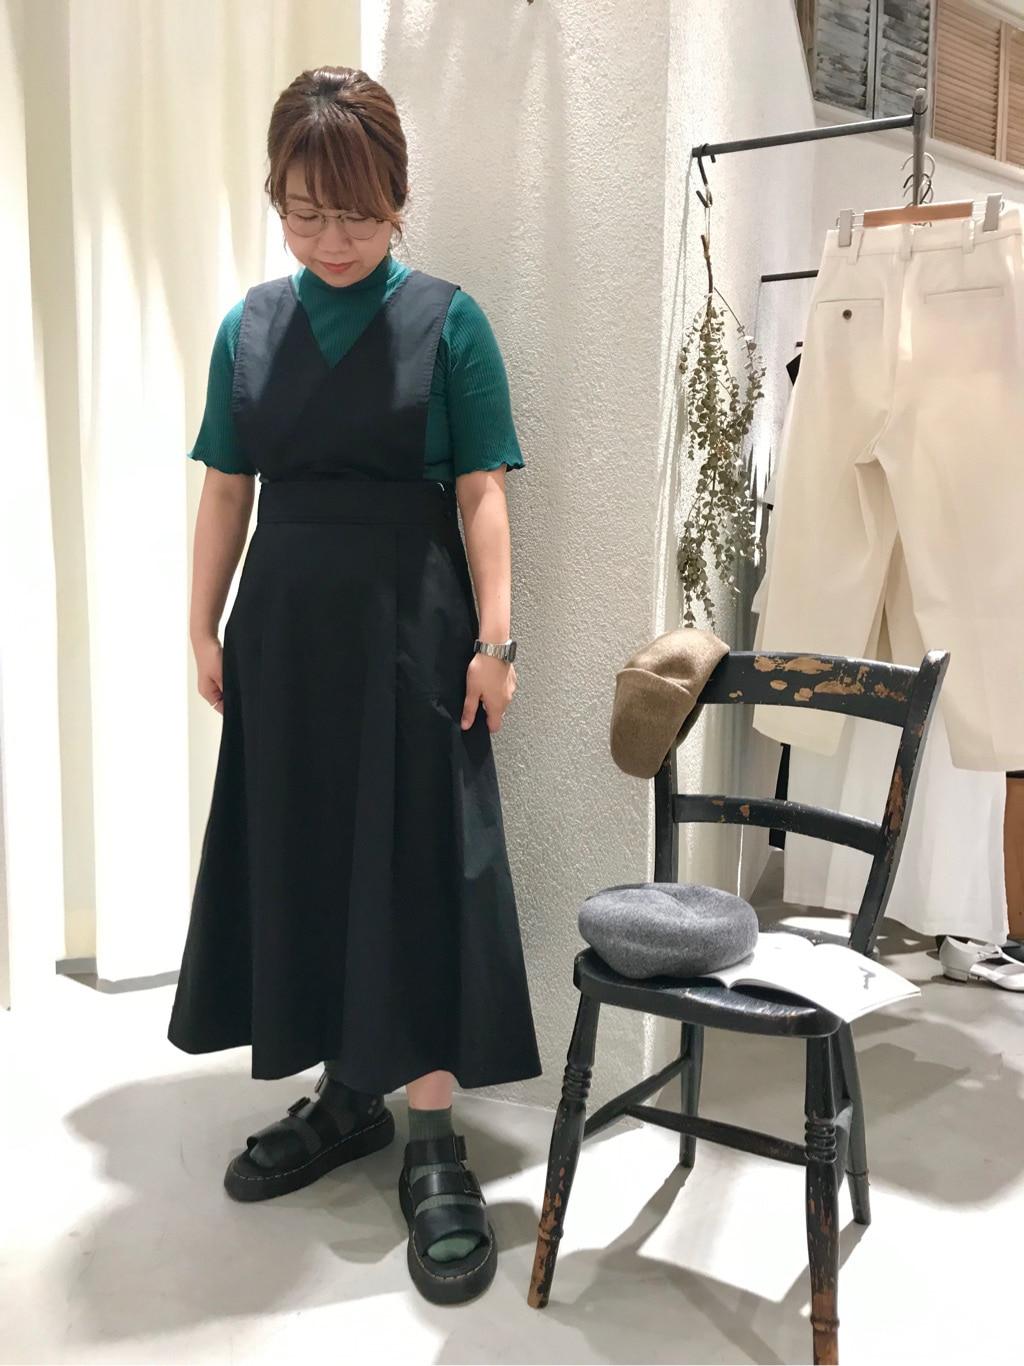 chambre de charme キラリナ京王吉祥寺 身長:155cm 2020.08.25